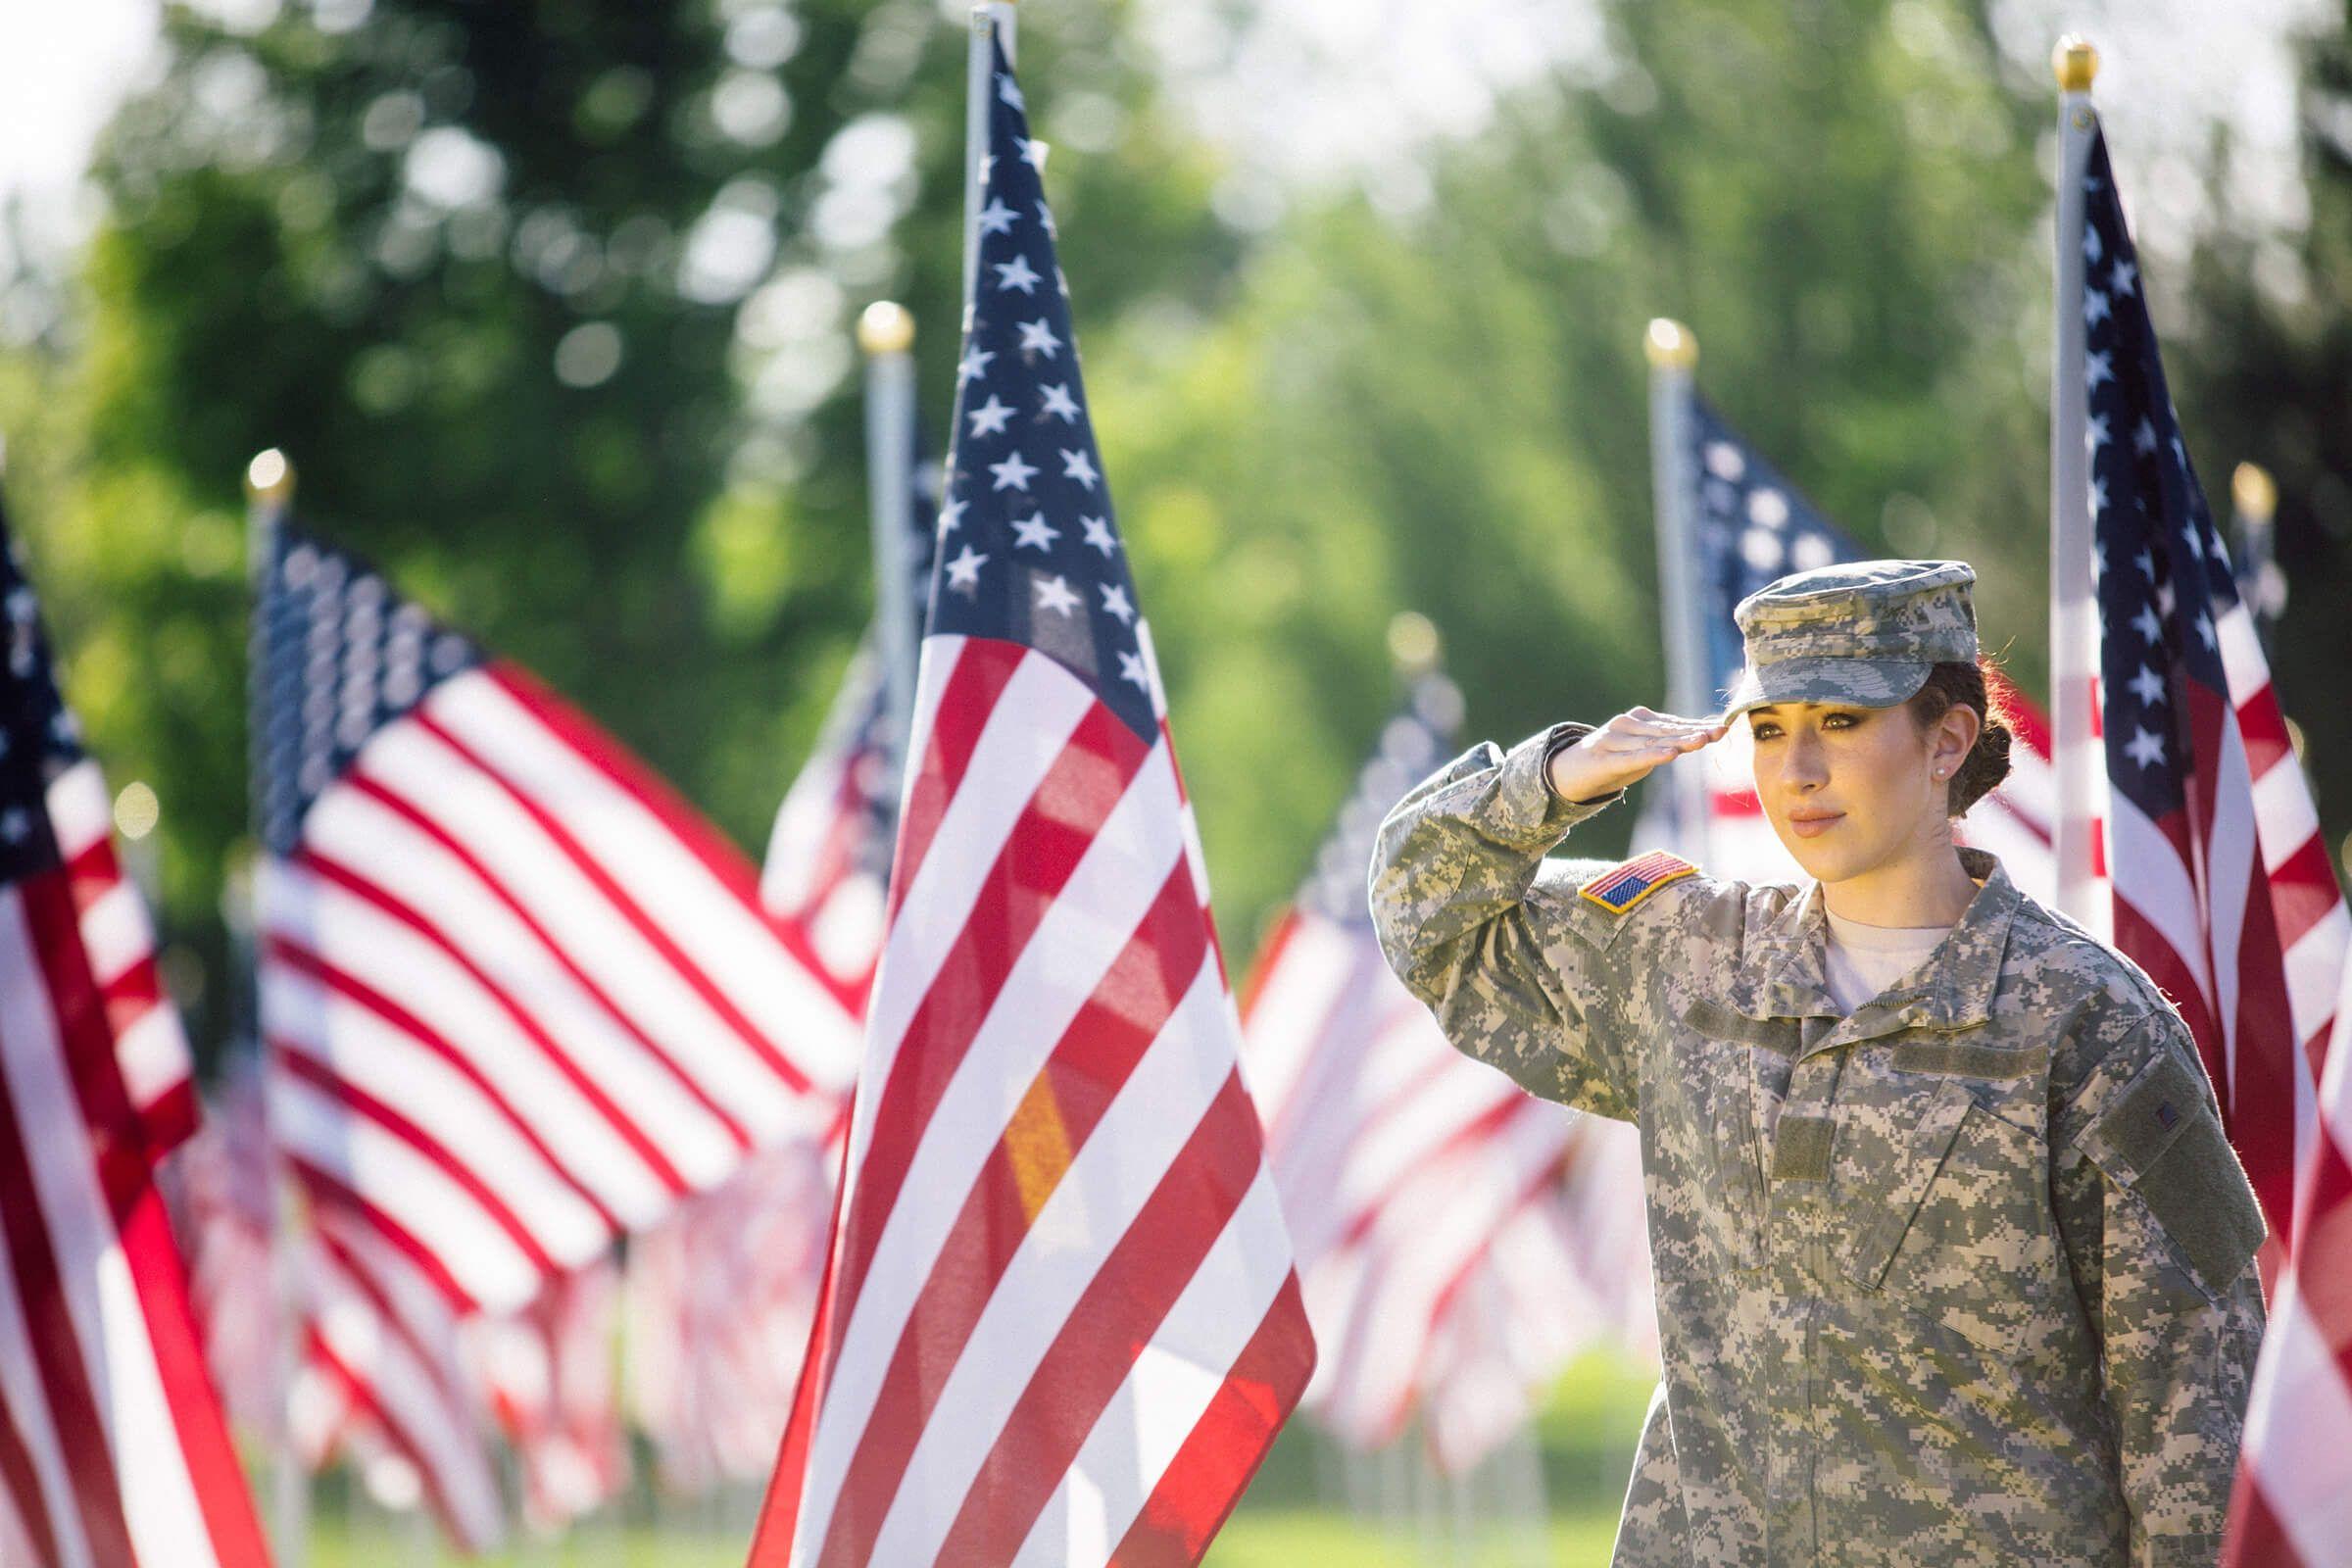 diversity-inclusion-soldier-salute-flag